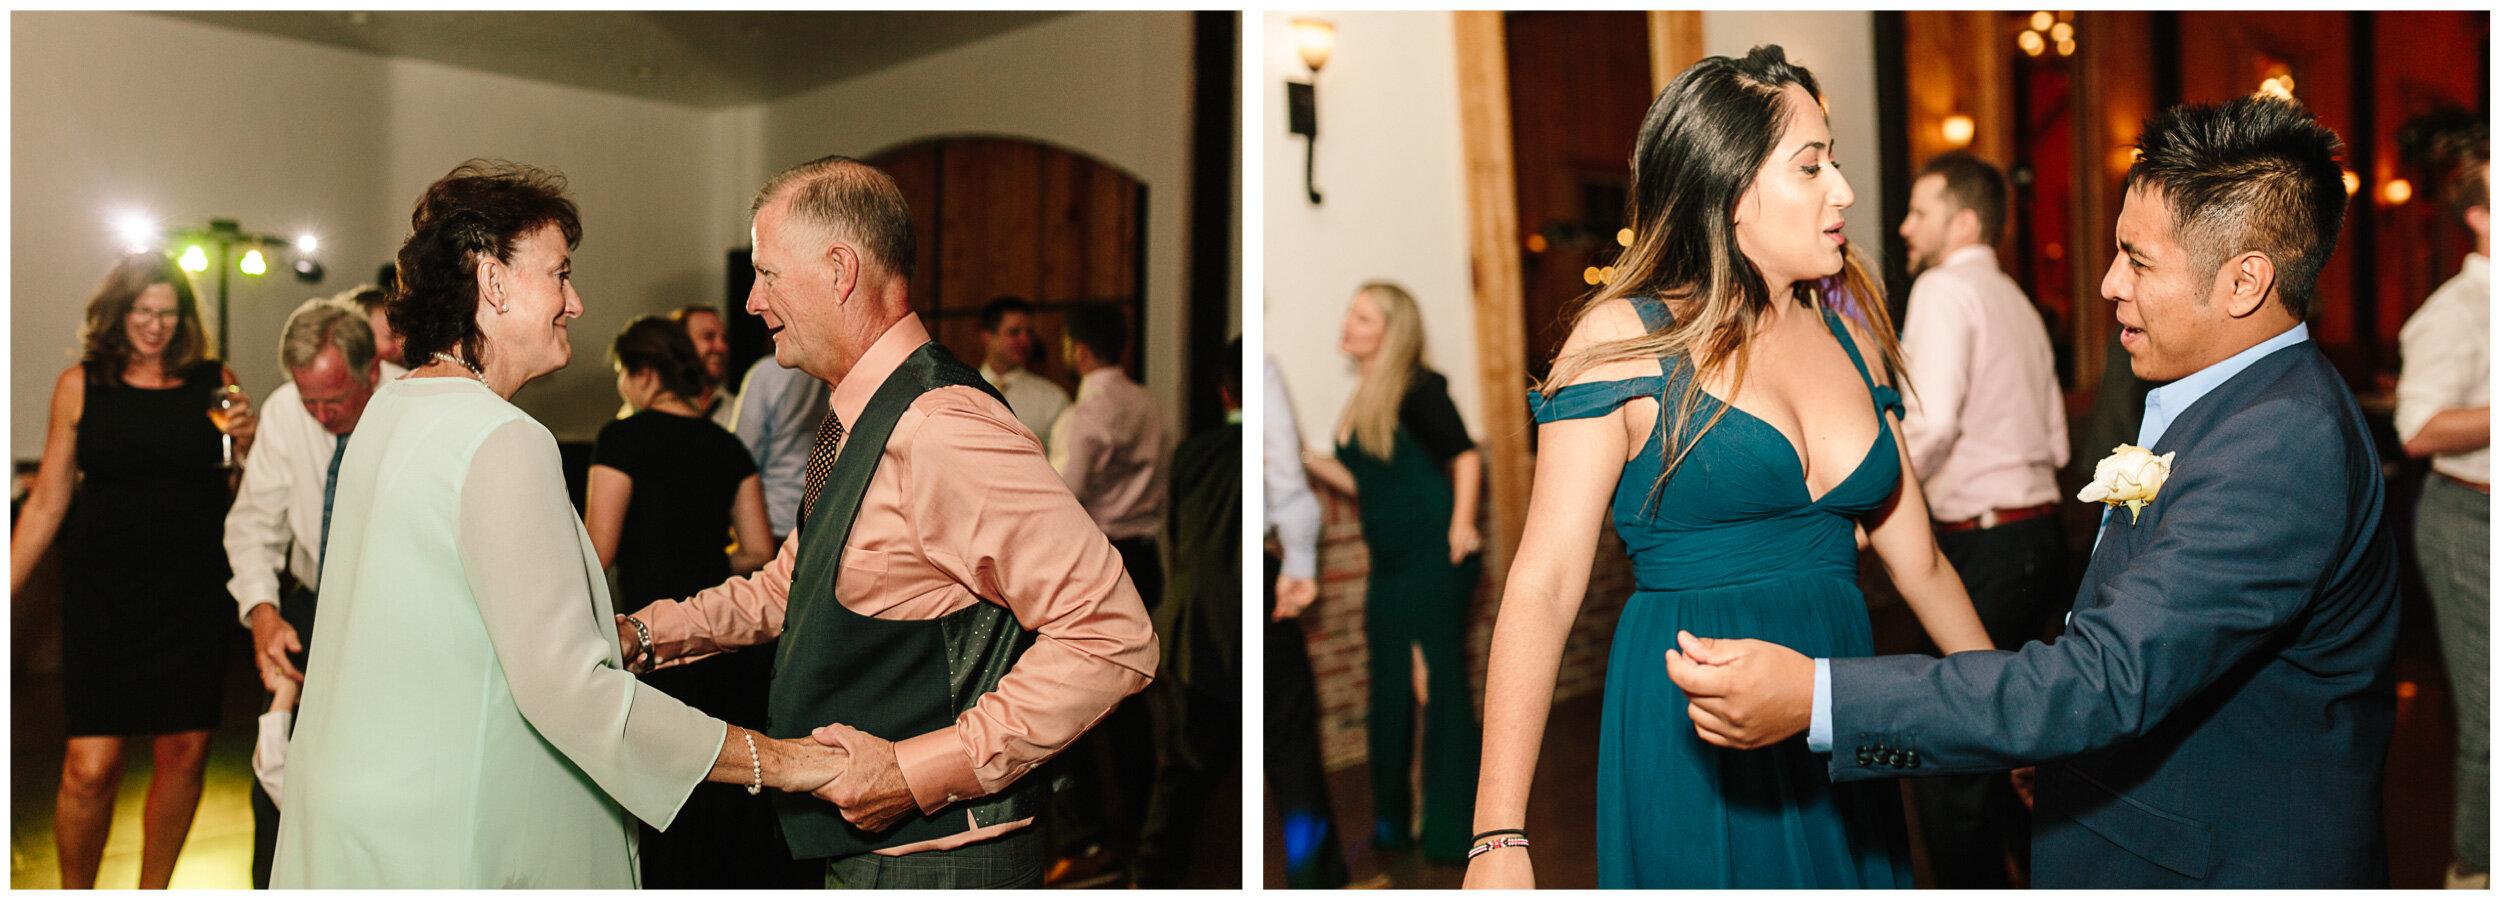 larkspur_colorado_wedding_72.jpg